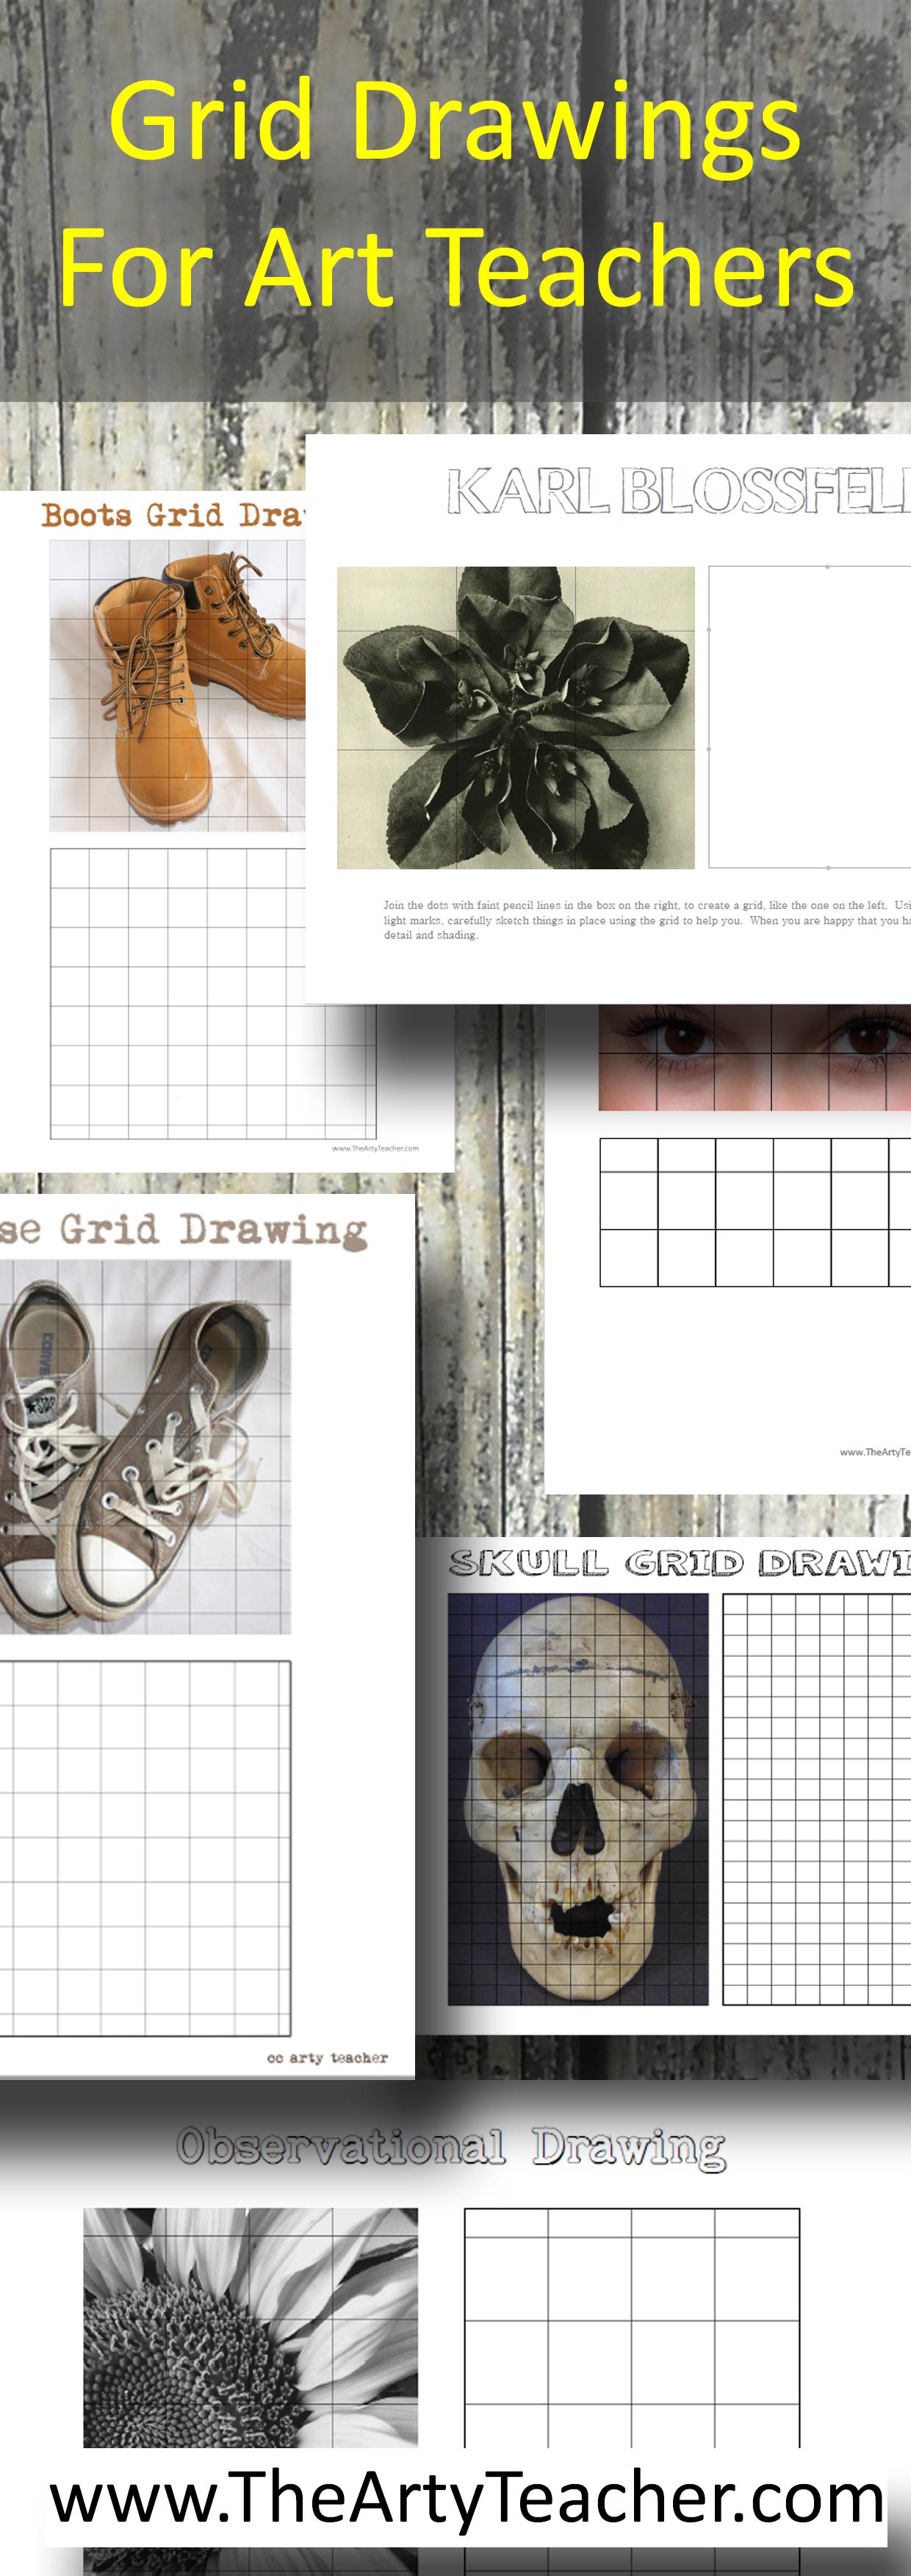 Grid Drawings For Art Teachers Art Resources For Art